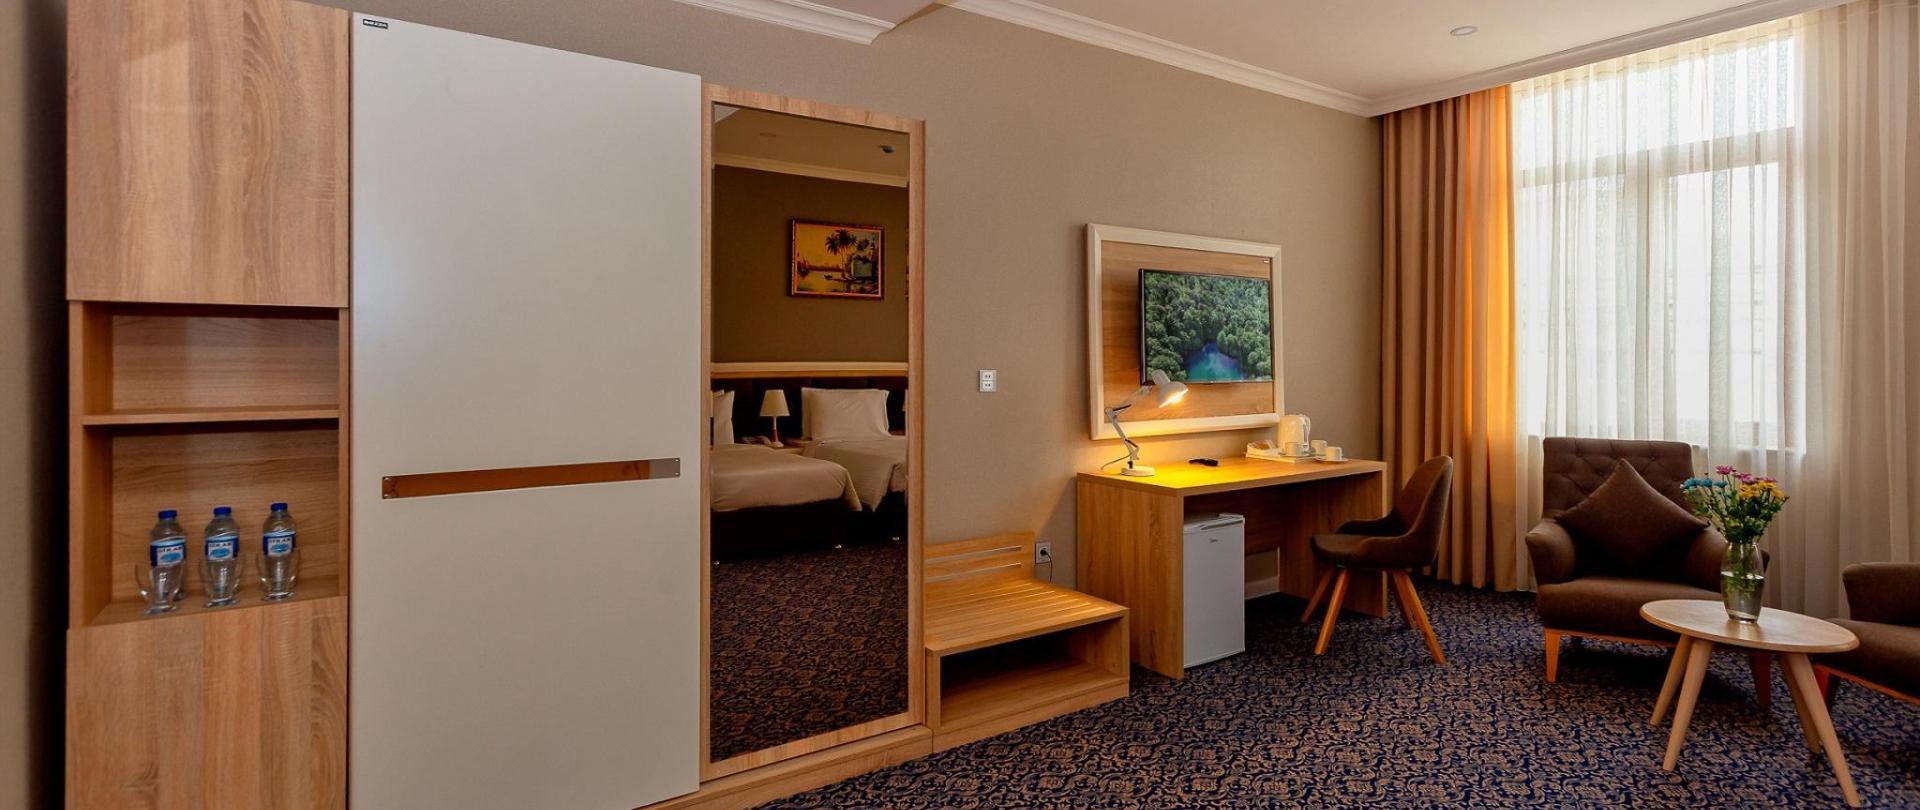 Metrocity Hotel-2.jpg